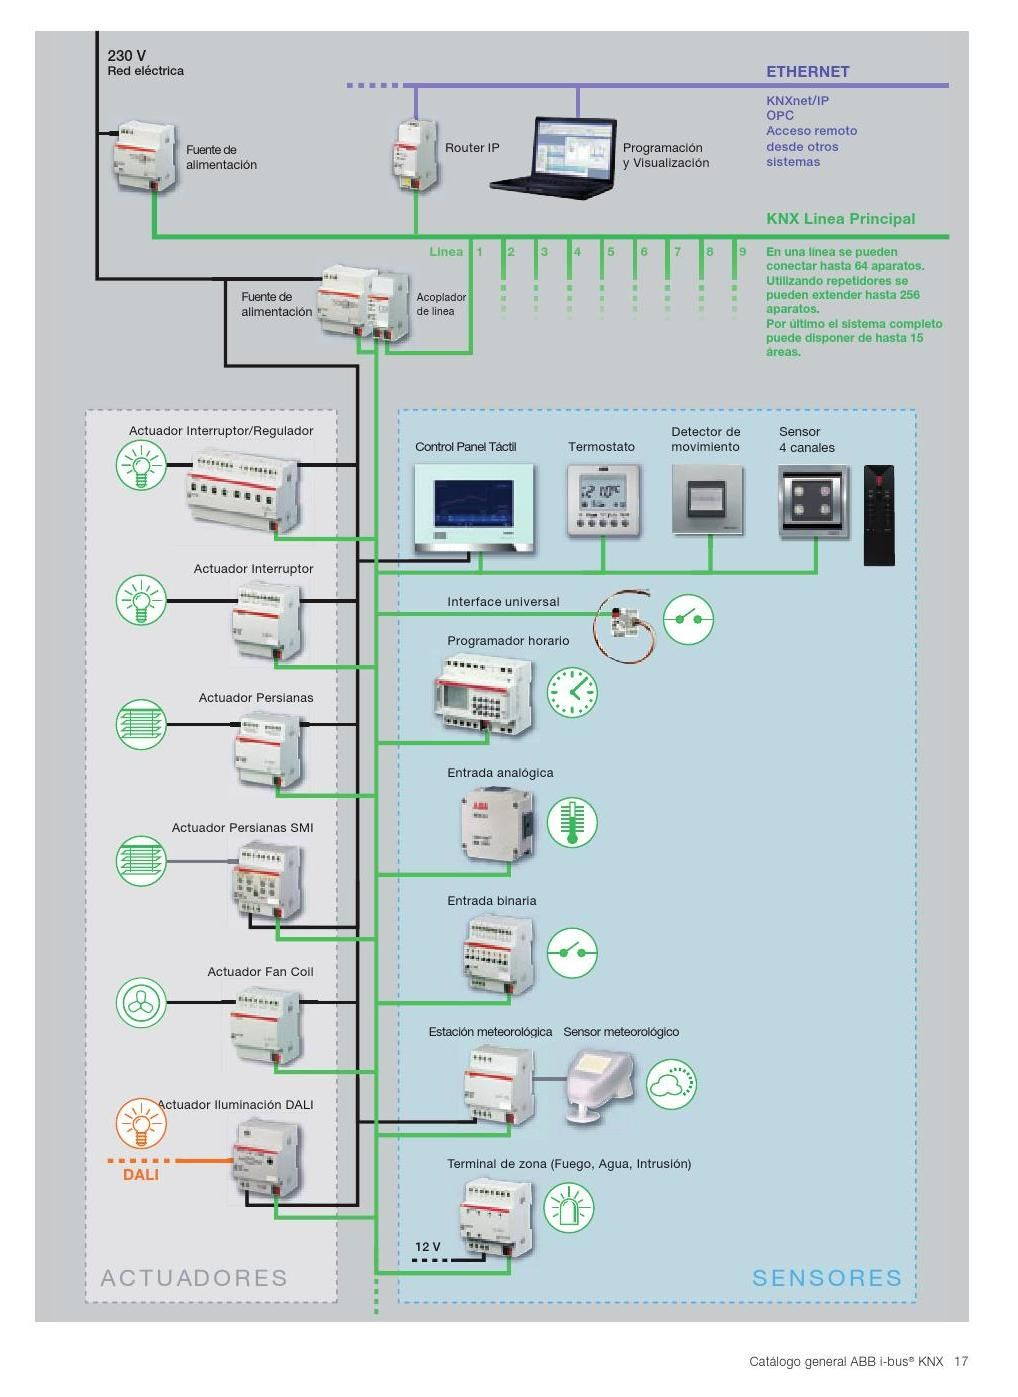 Pleasant Knx Home Automation Wiring Diagram Flisol Home Wiring Digital Resources Minagakbiperorg